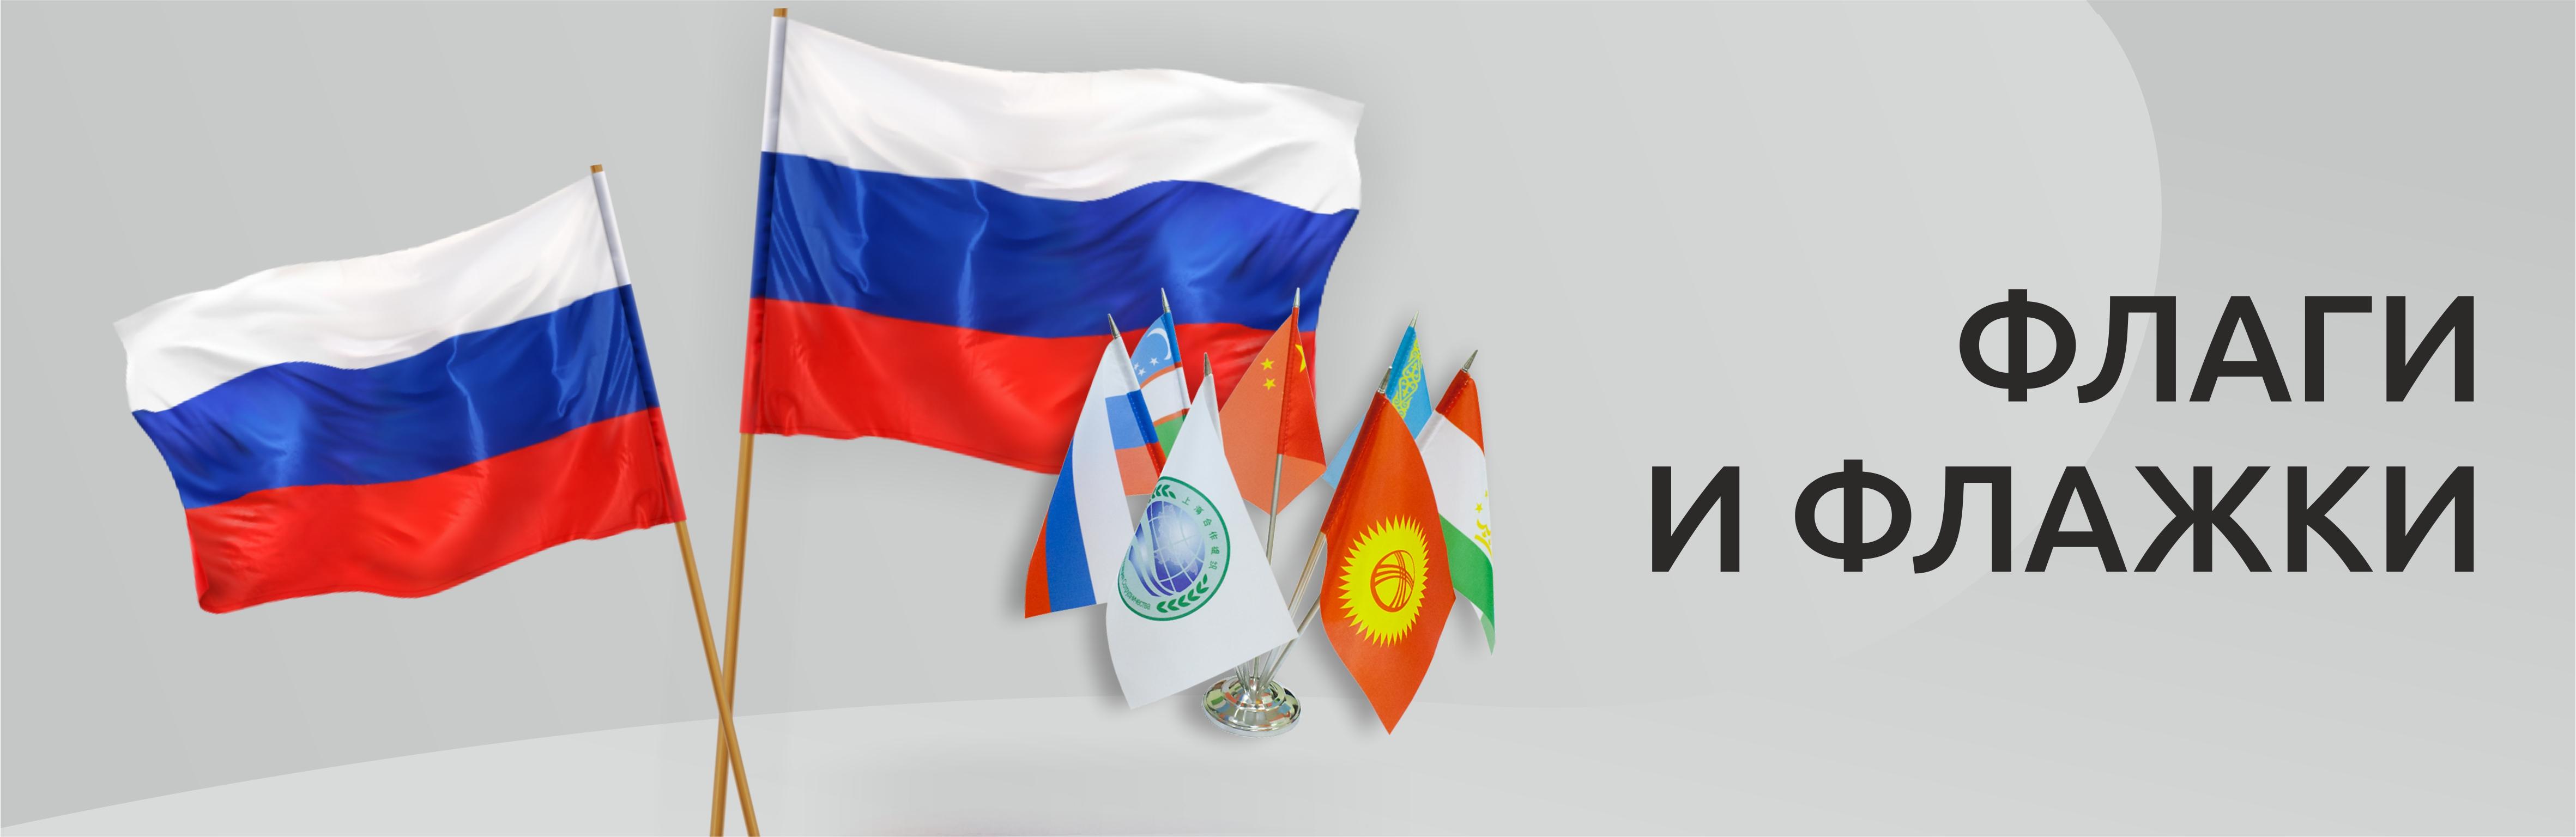 изготовить флаг на заказ с логотипом